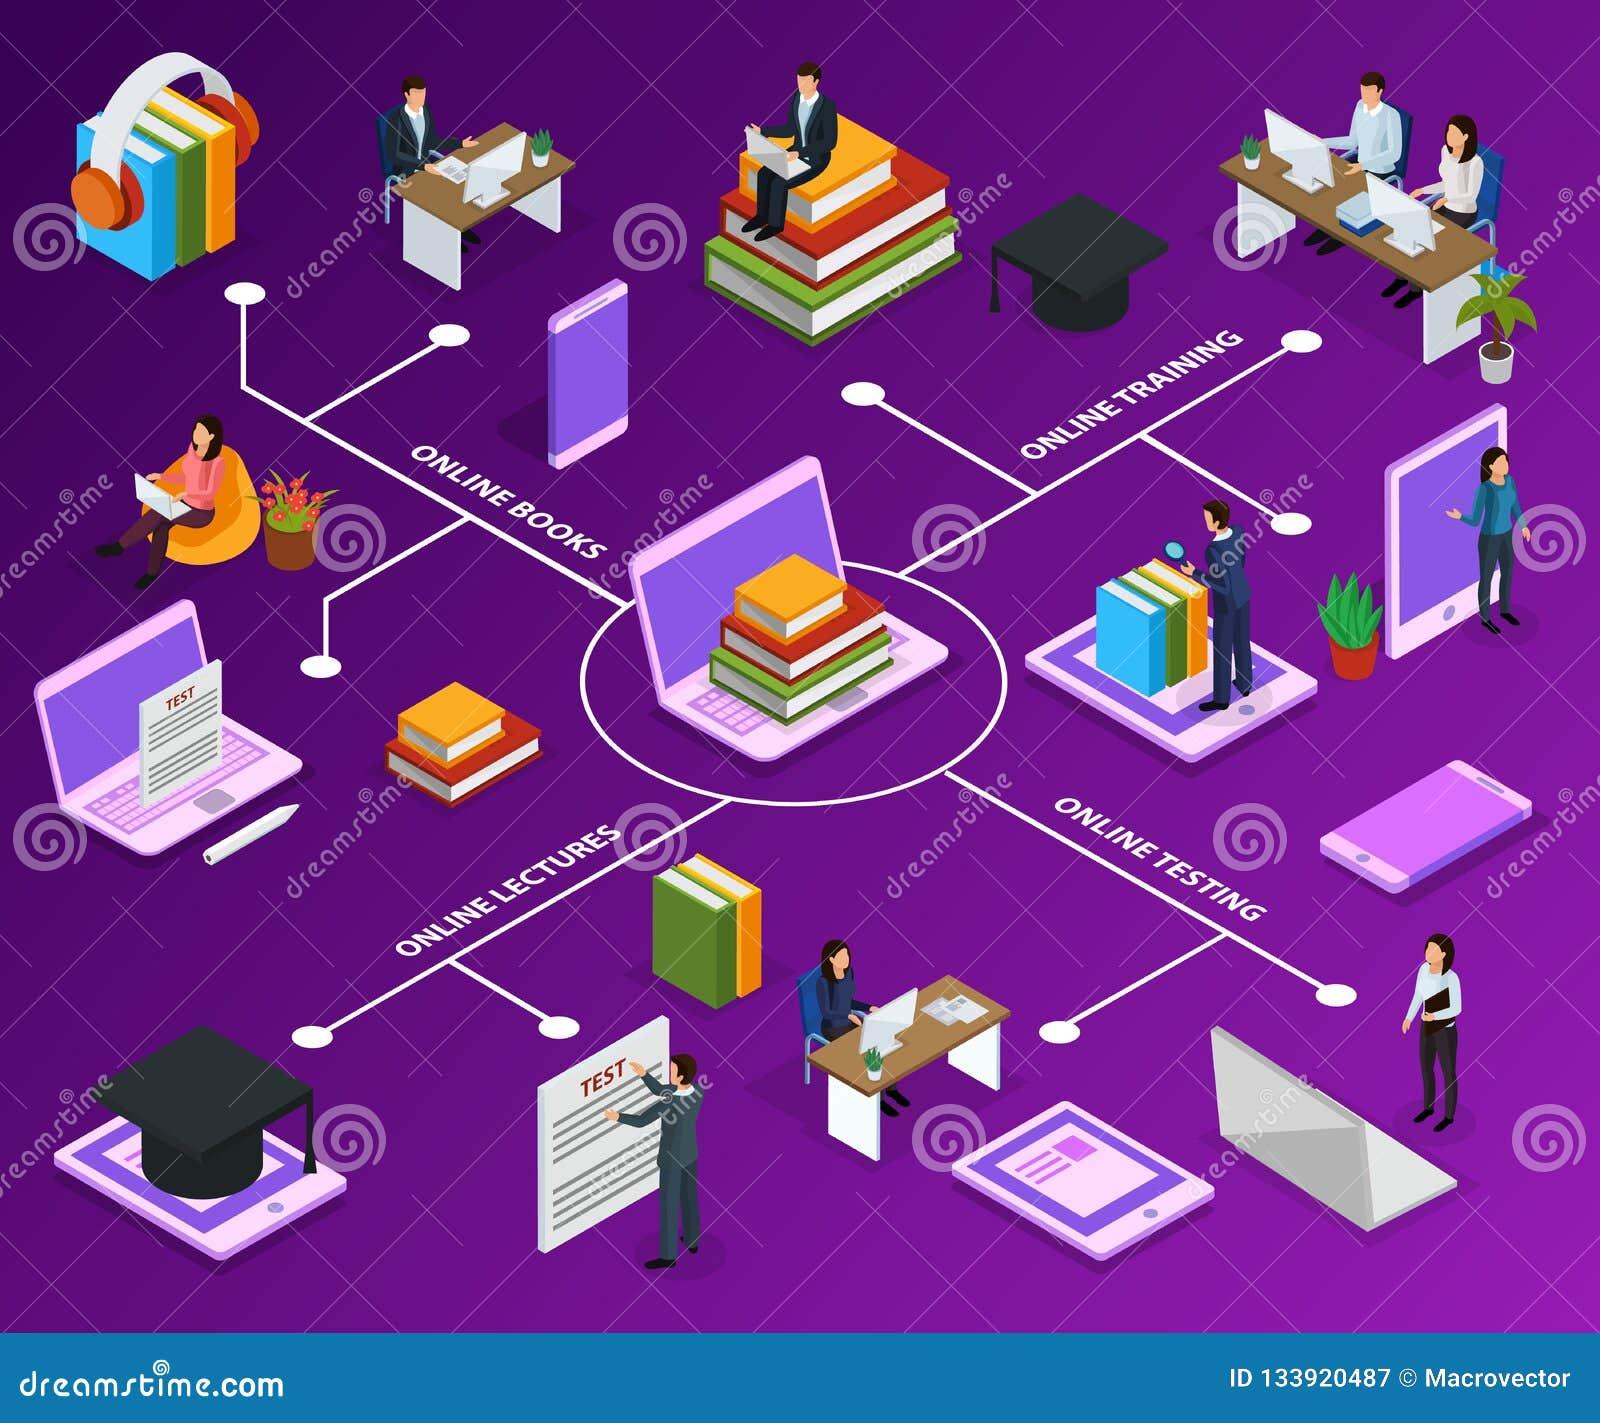 Online Education Isometric Flowchart